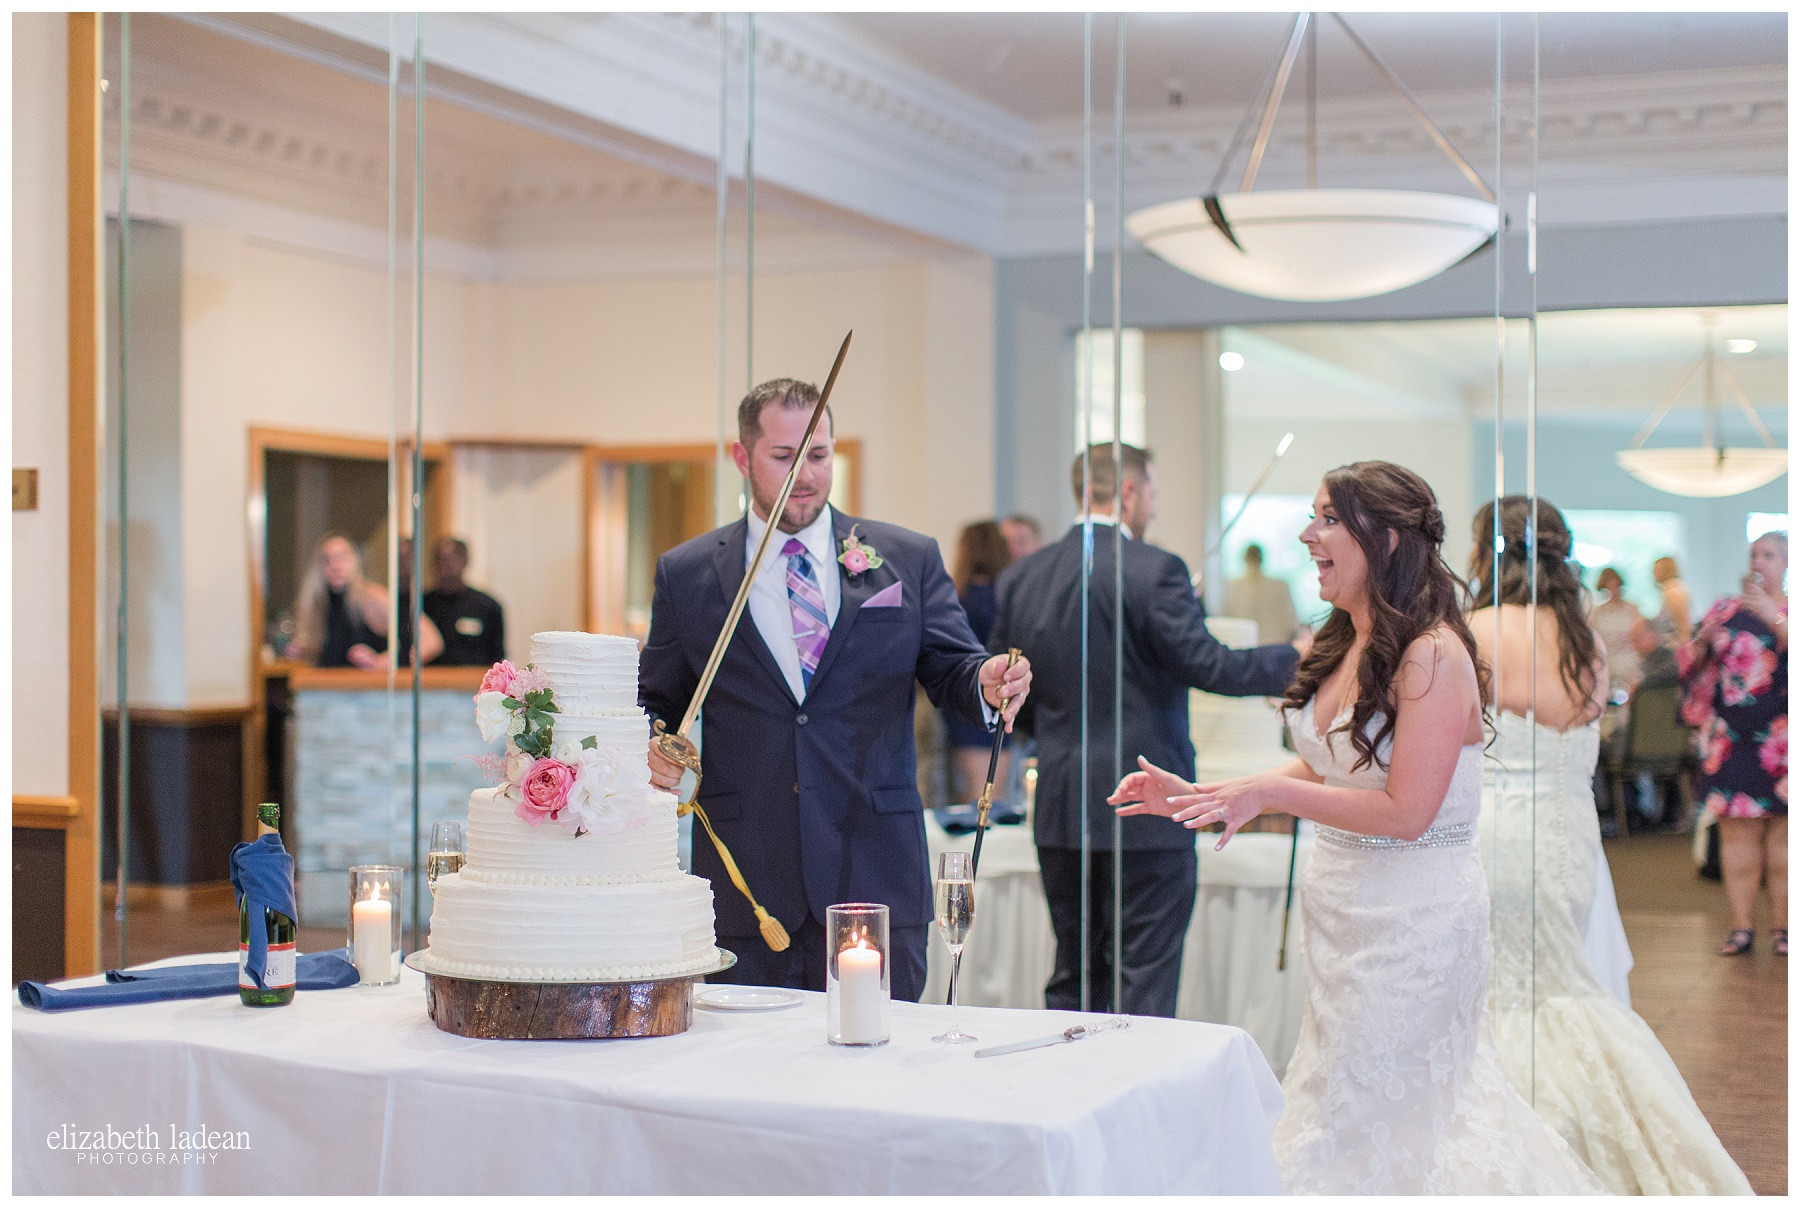 Hillcrest-Country-Club-Kansas-City-Wedding-Photography-E+J-0520-Elizabeth-Ladean-Photography-photo_0859.jpg